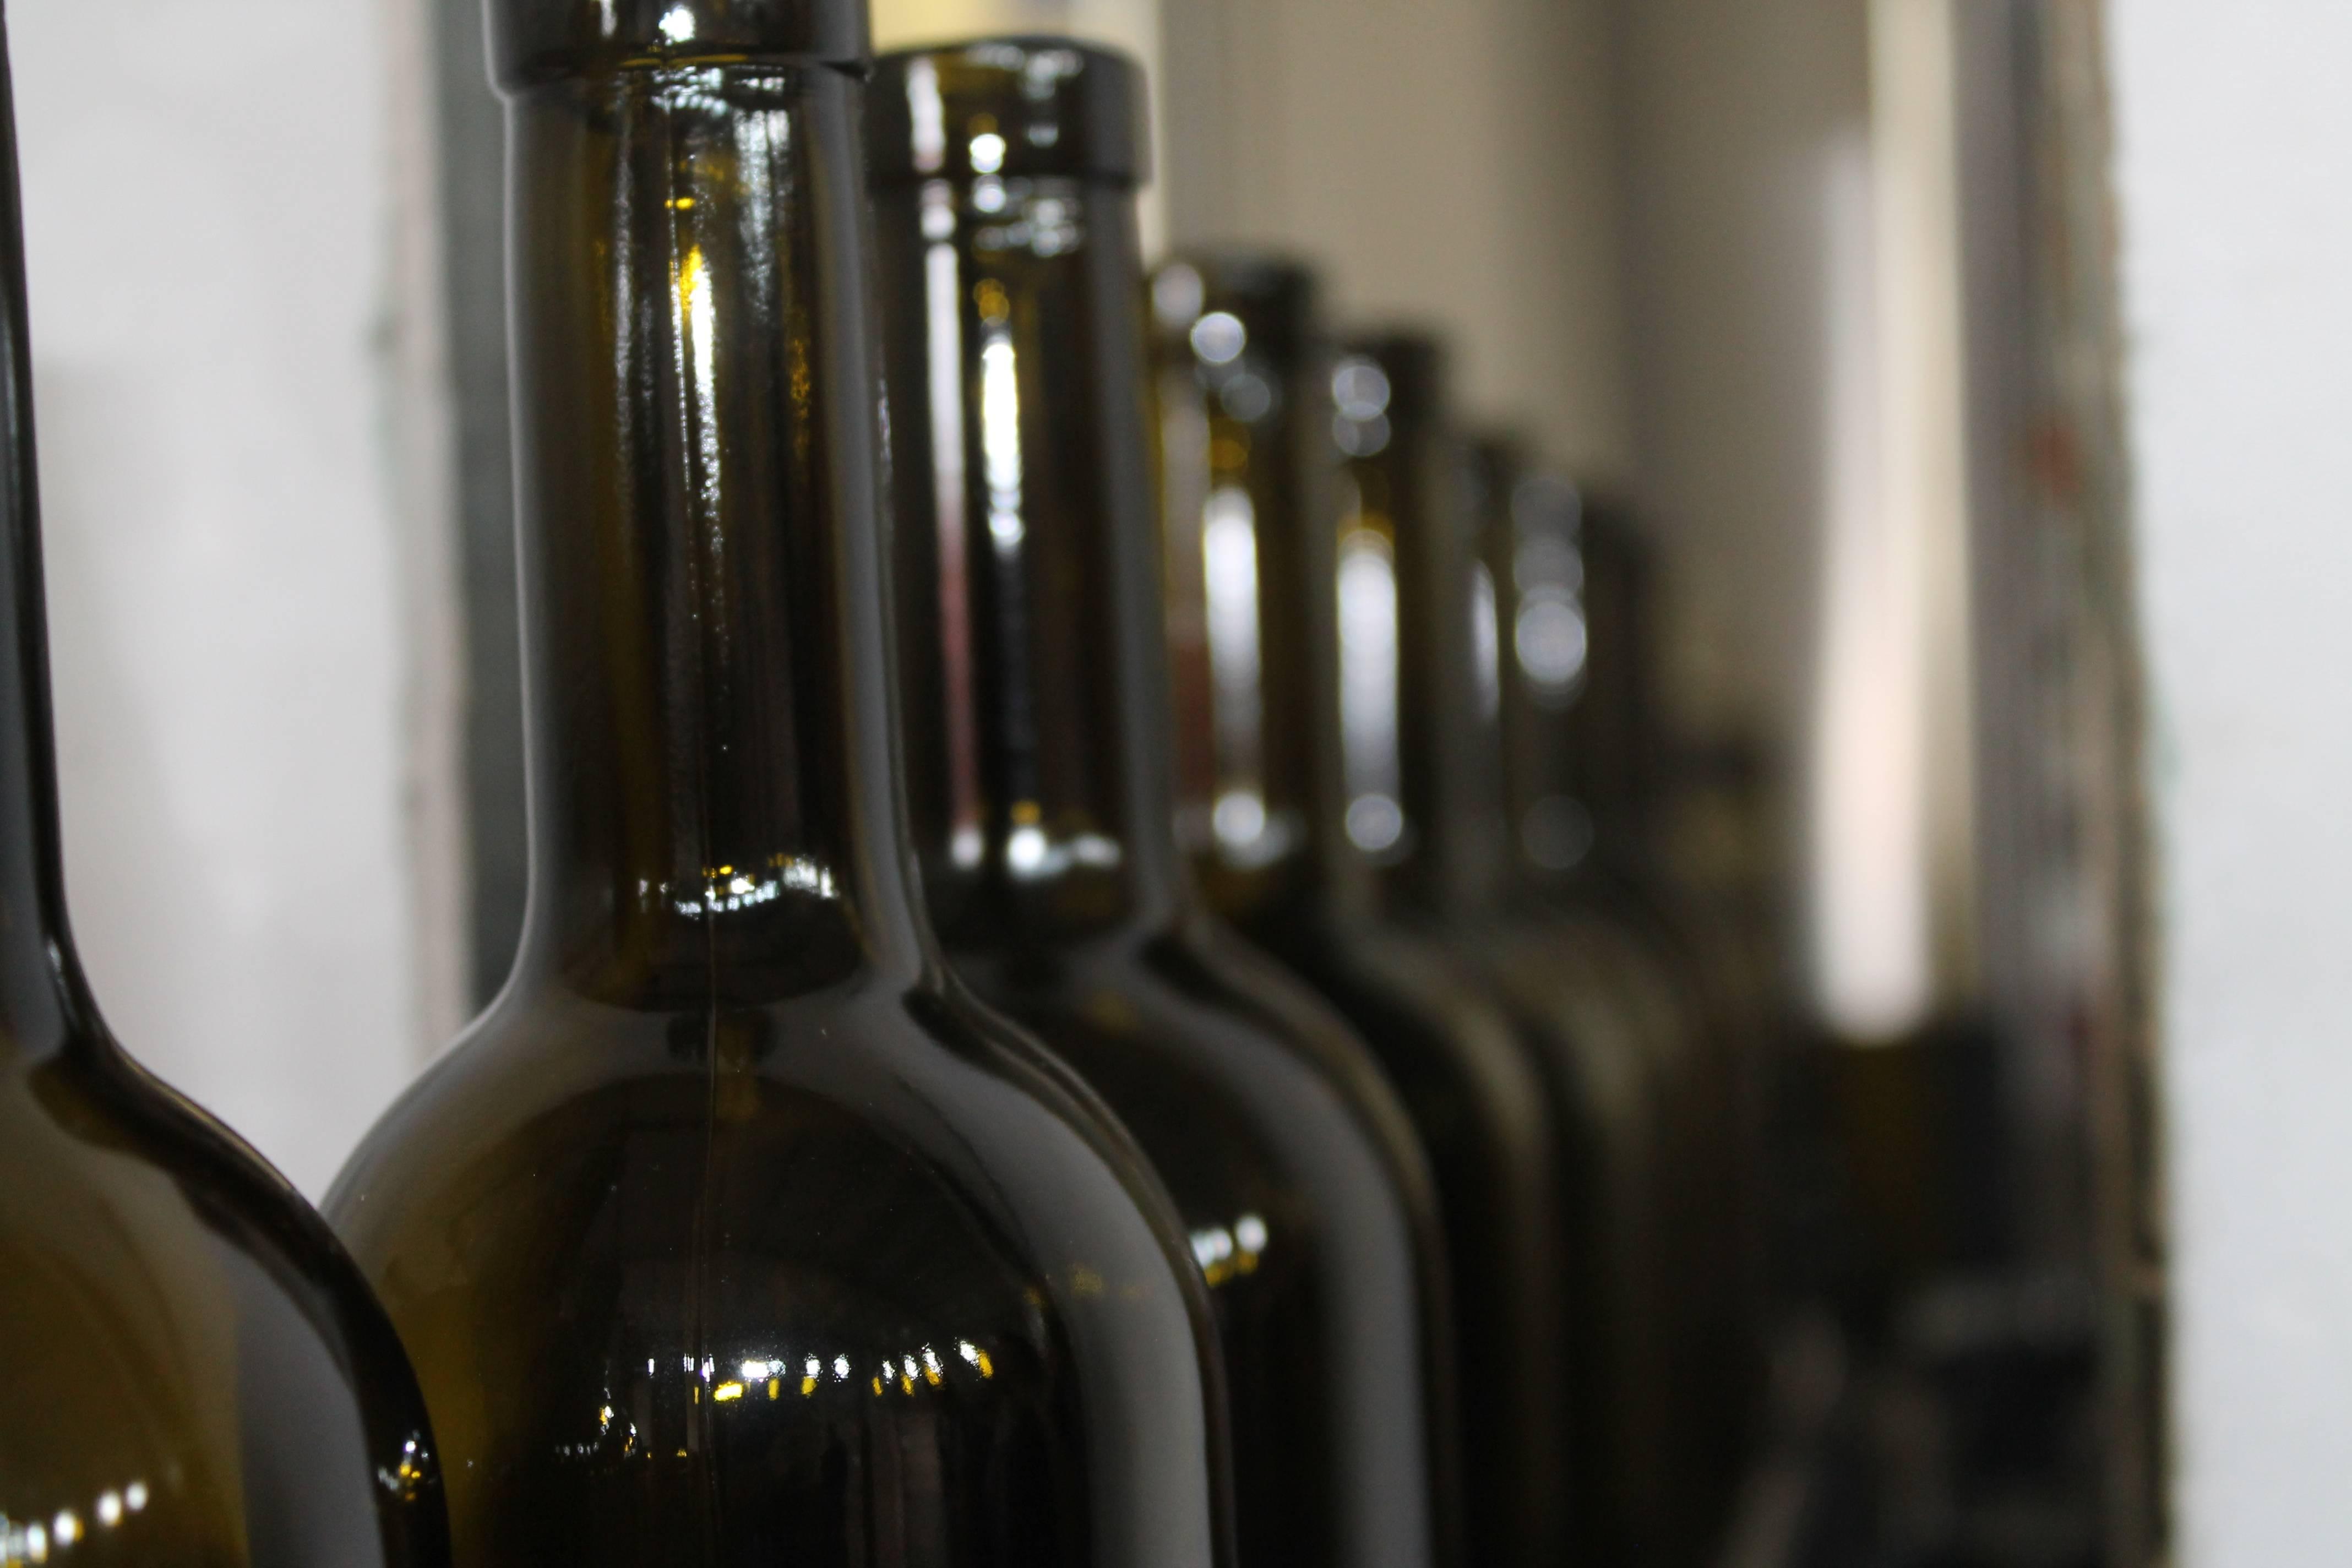 Молдавские вина: названия, цены